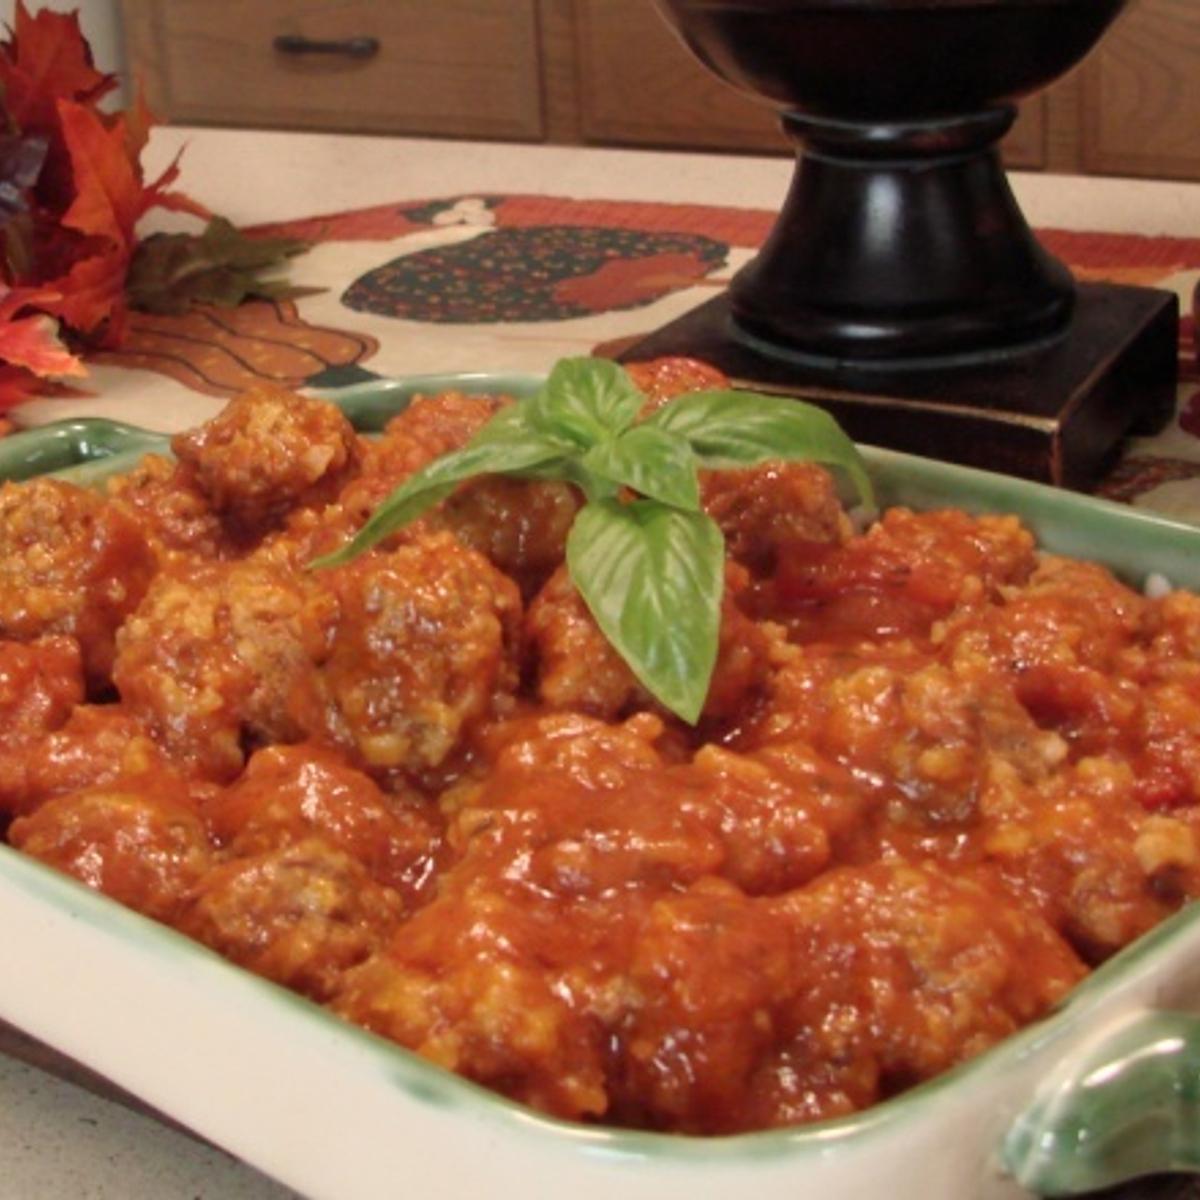 Porky-Pine Meatballs Recipe